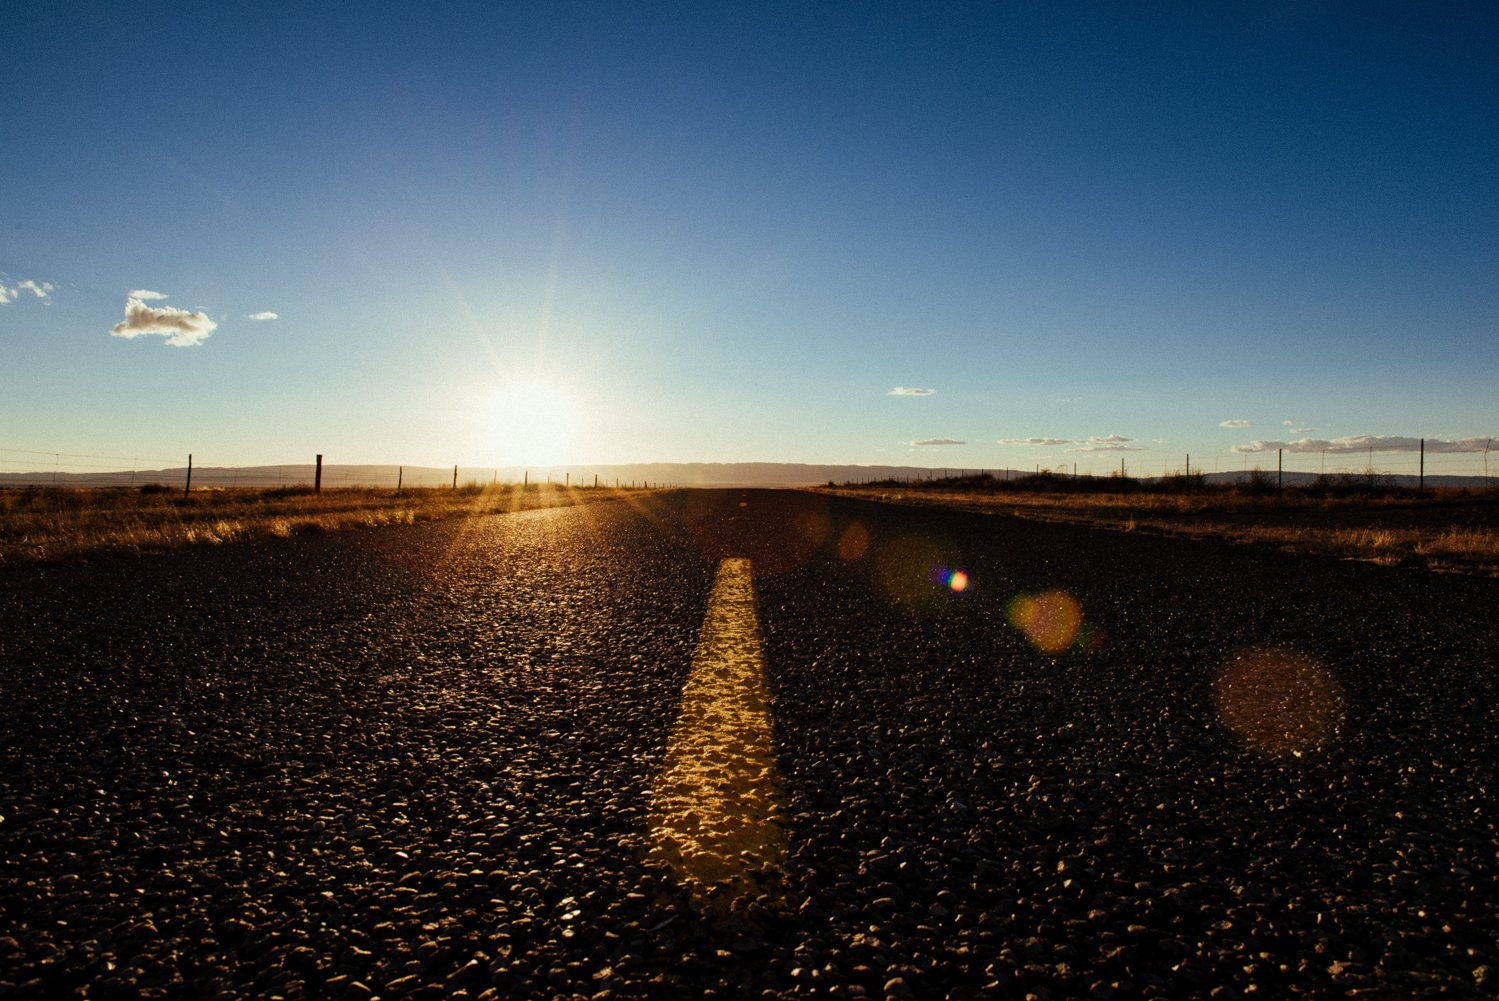 USA ROADTRIP TRAVEL PHOTOGRAPHY-48